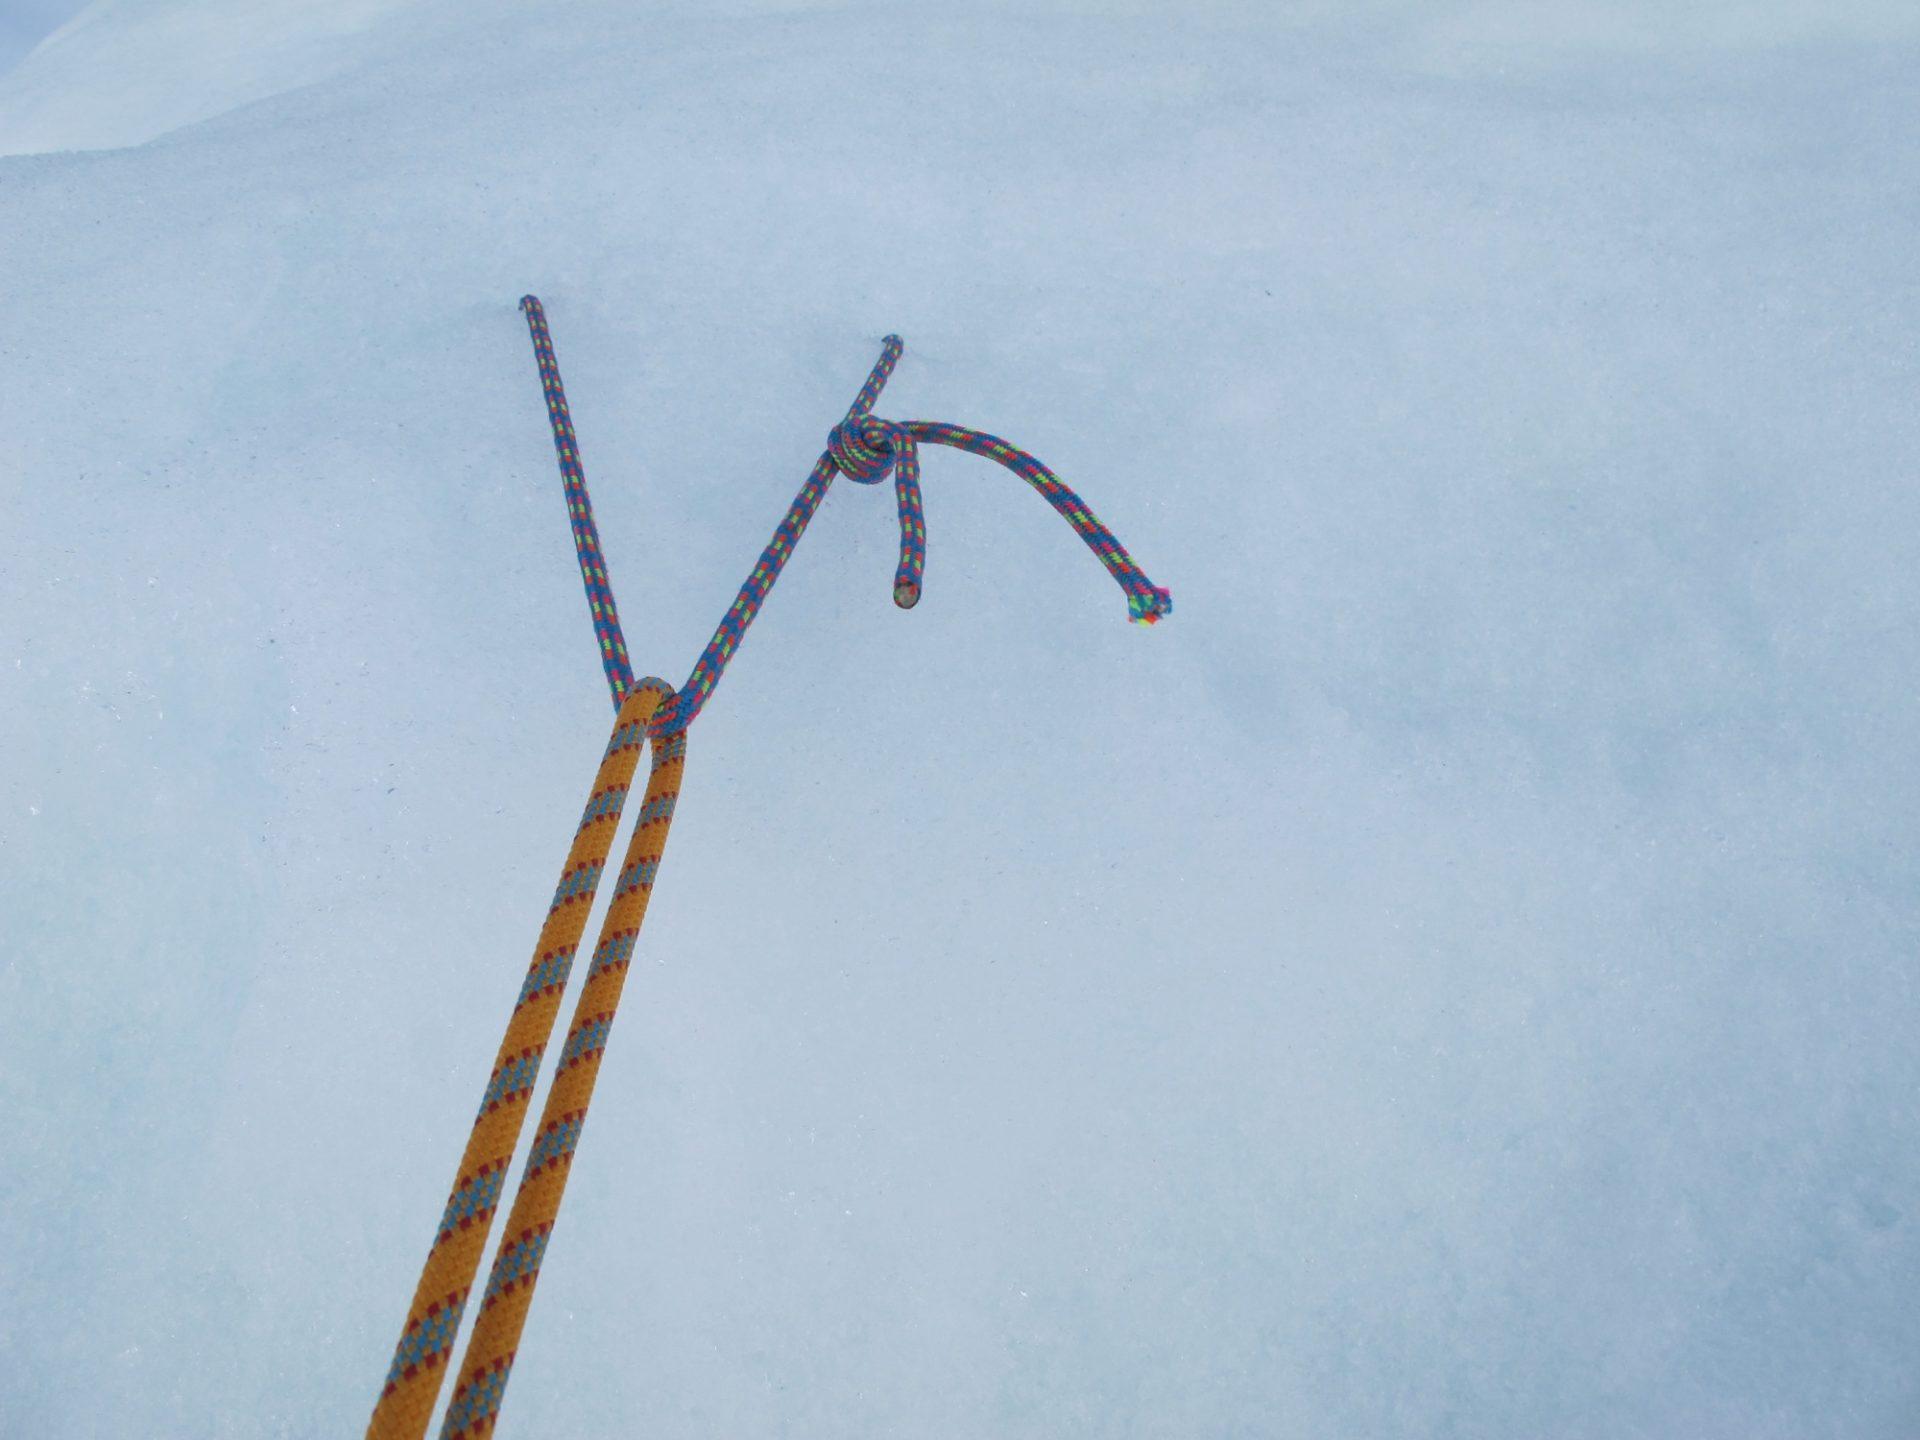 Bergsteigertipp: Fixpunkte im Eis